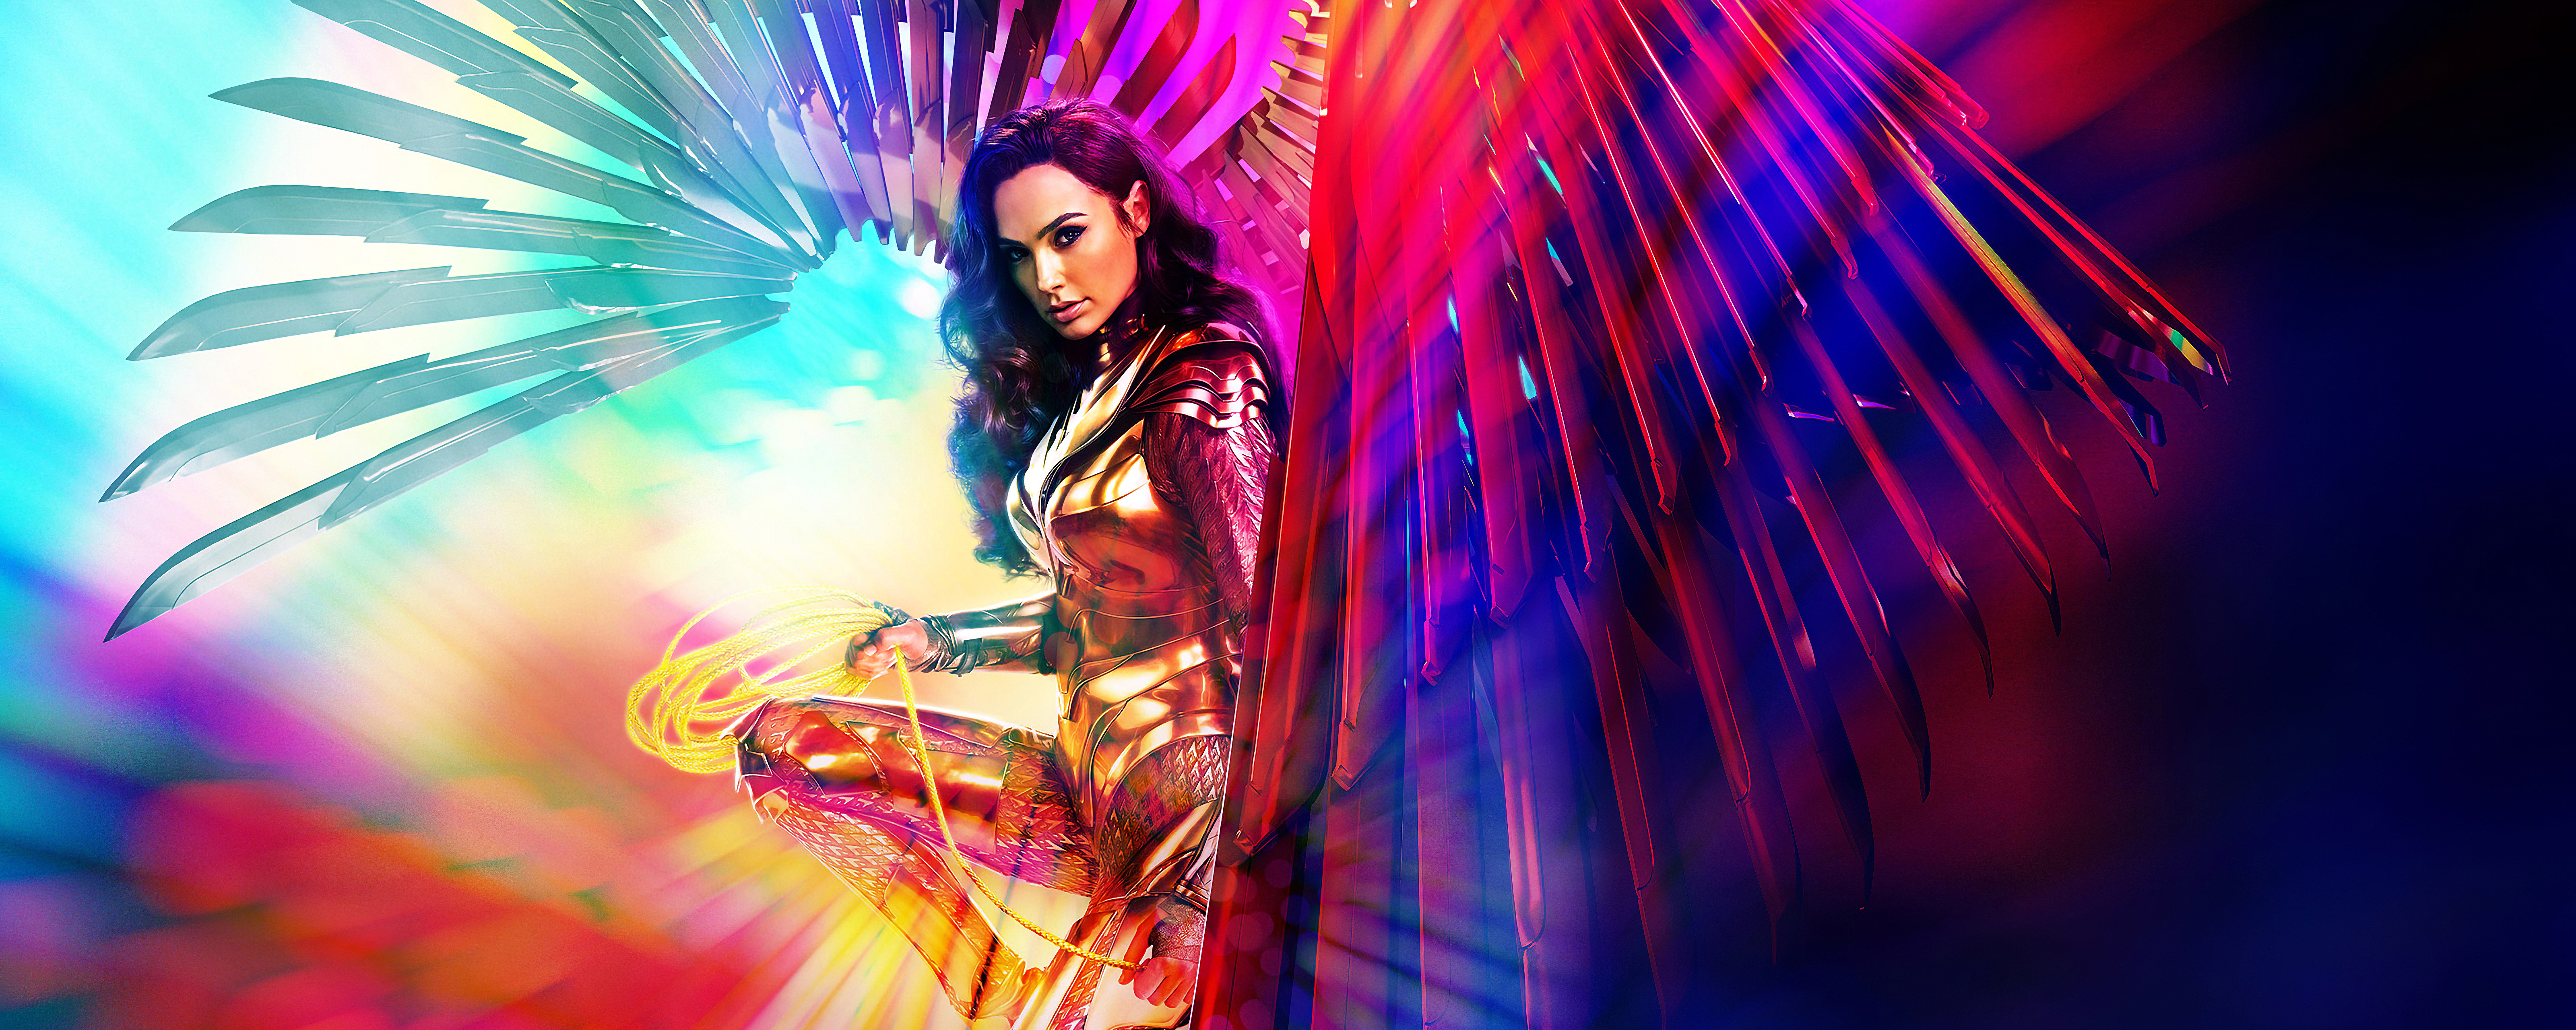 wonder woman 1589579160 - Wonder Woman - Wonder Woman movie wallpapers 4k, Wonder Woman 4k wallpapers, Wonder Woman 2020 wallpapers